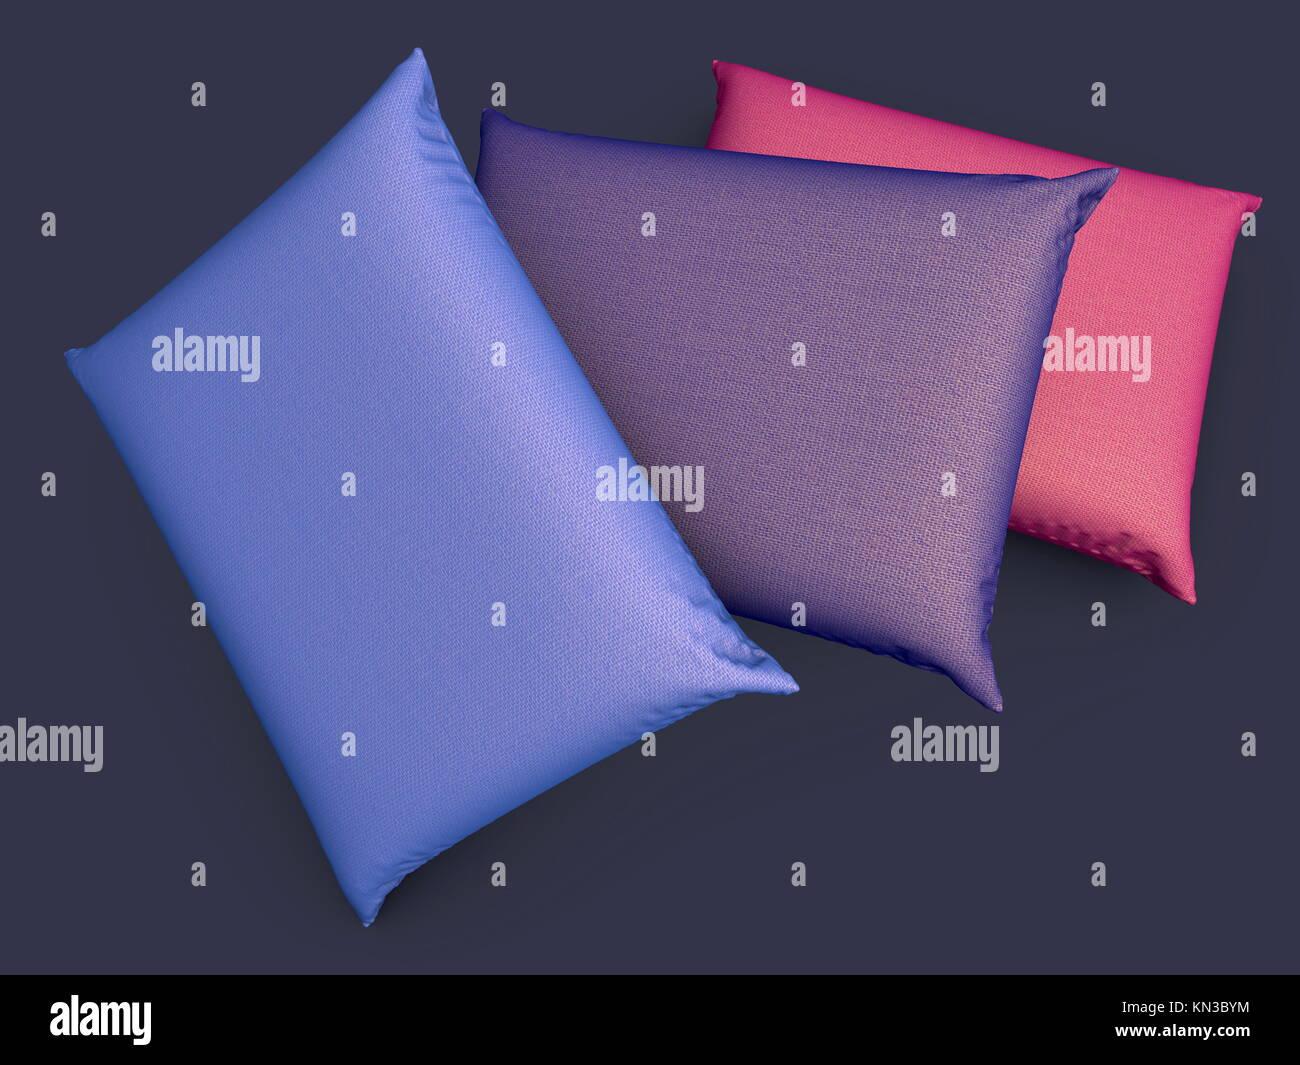 Three Pillows. 3D rendered Illustration. - Stock Image